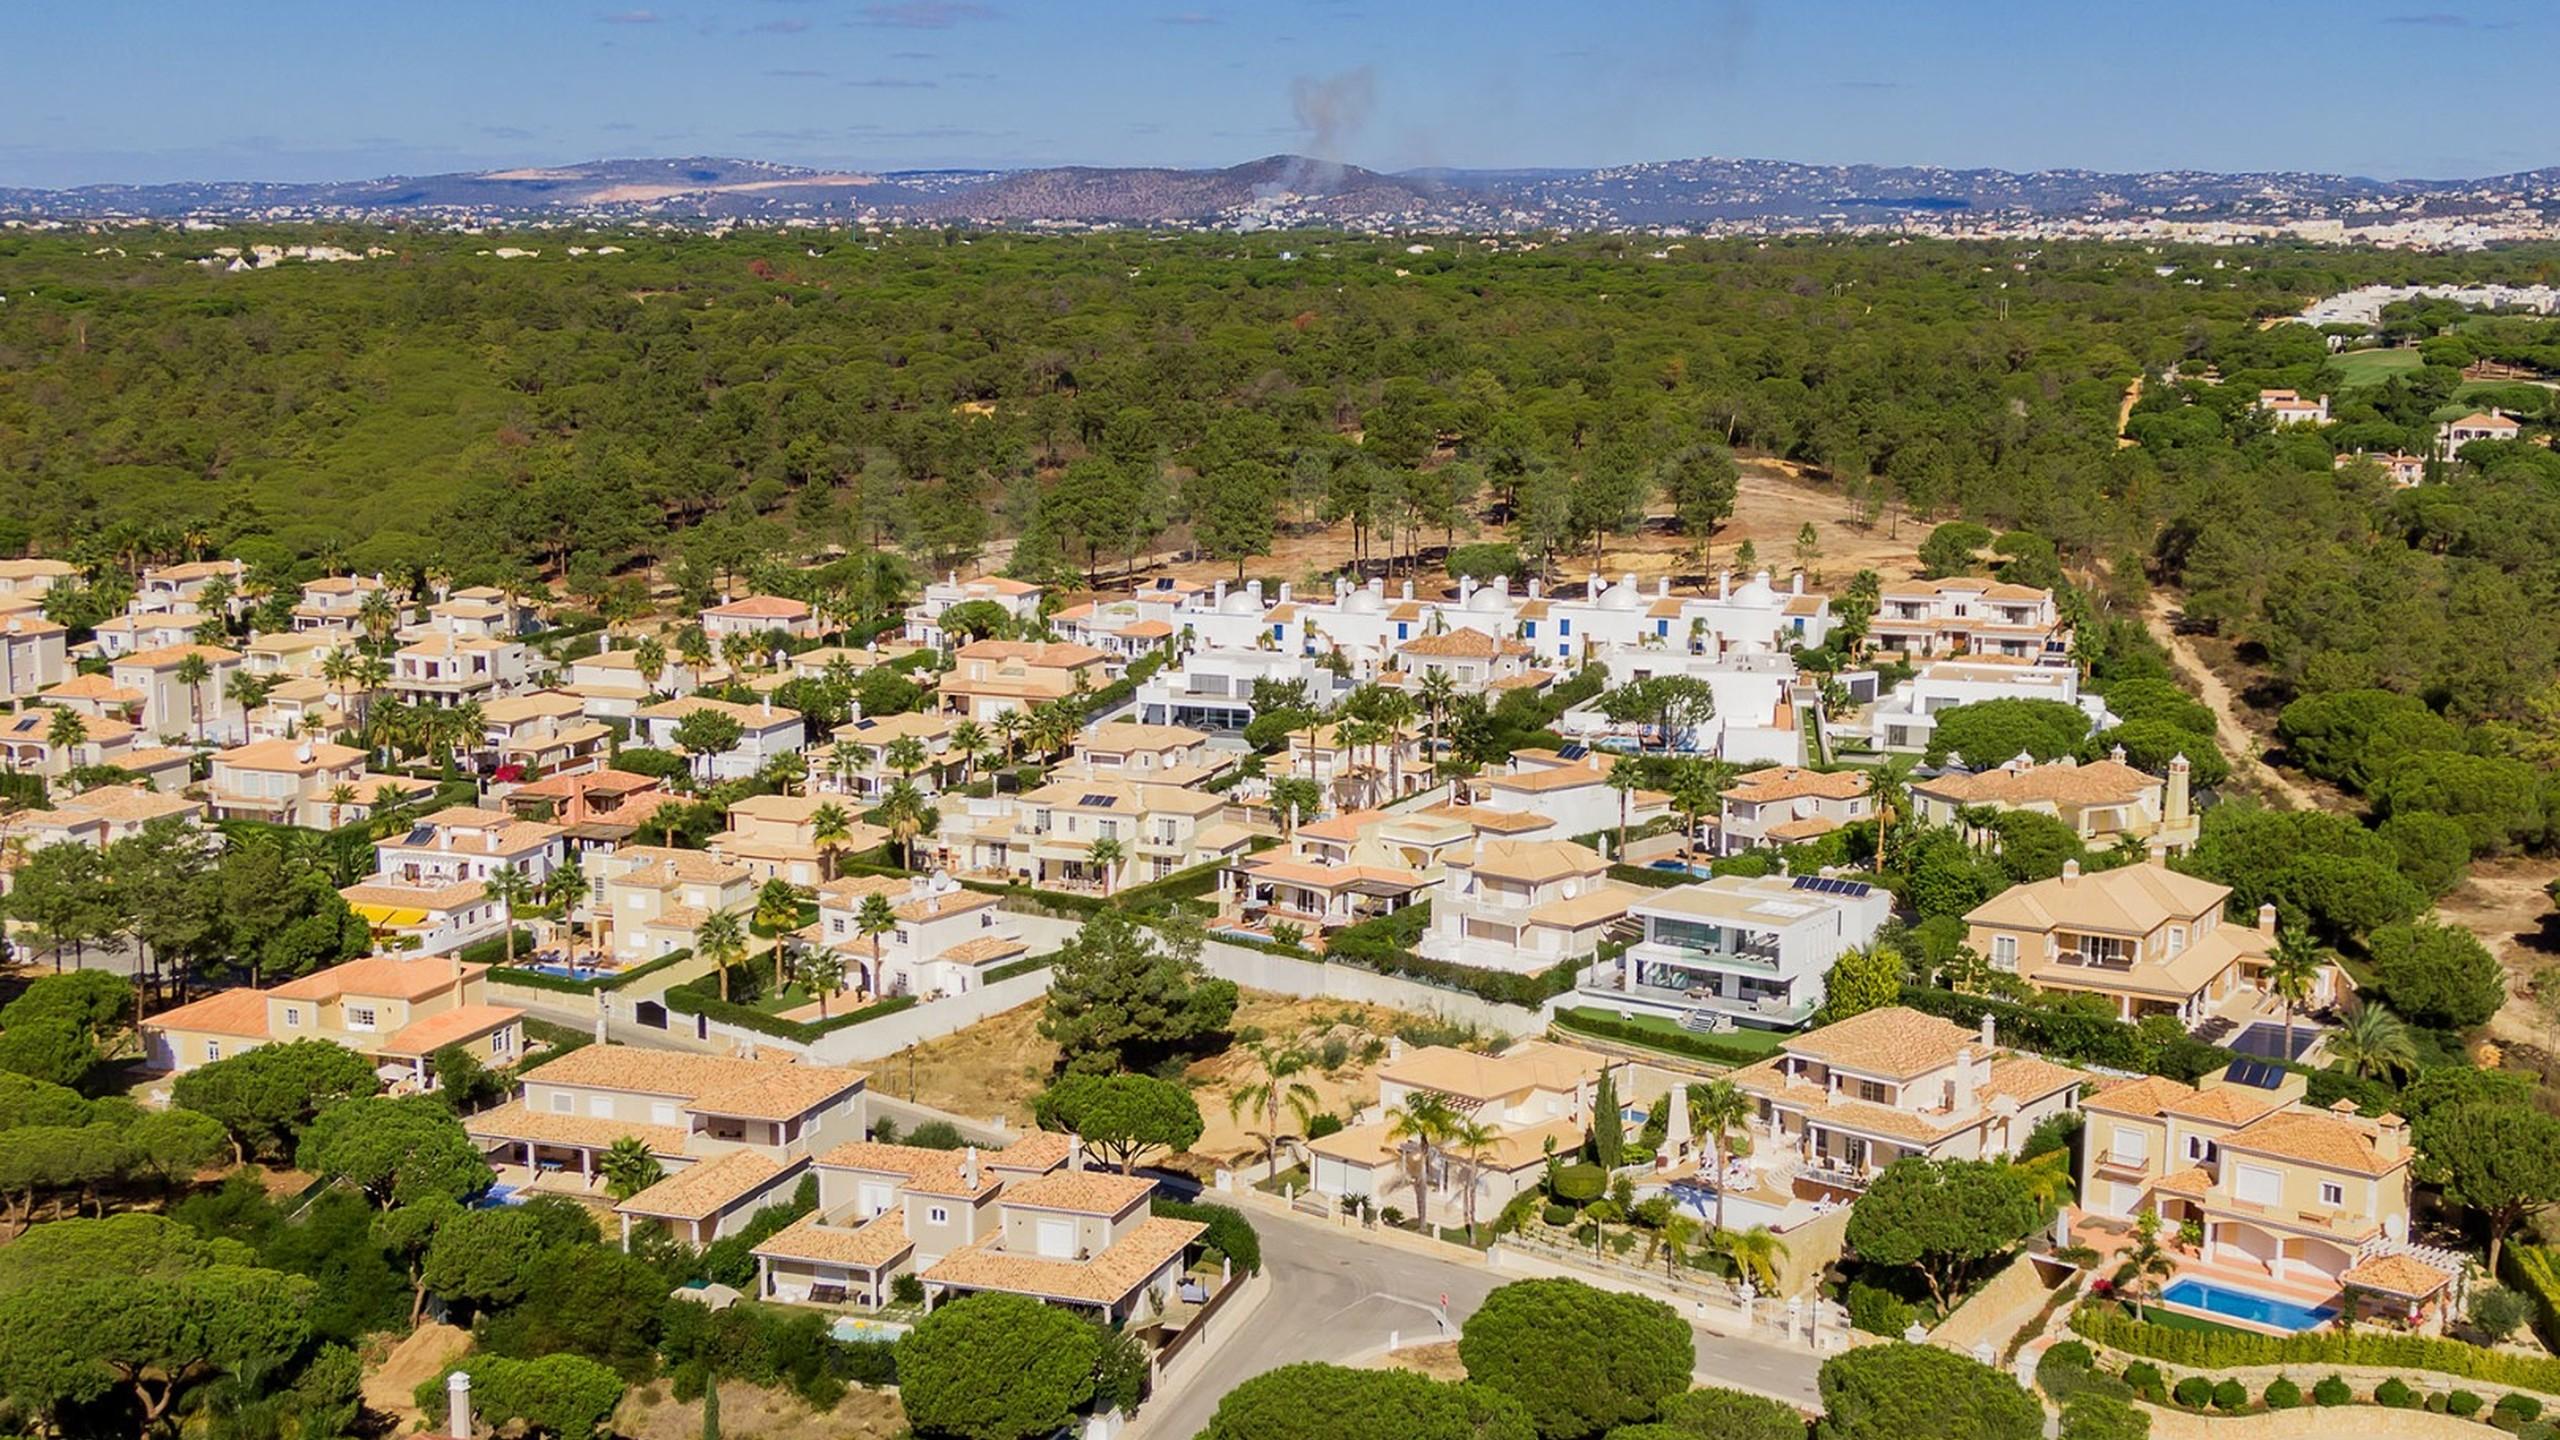 Terrain à vendre à Vale do Lobo, Algarve